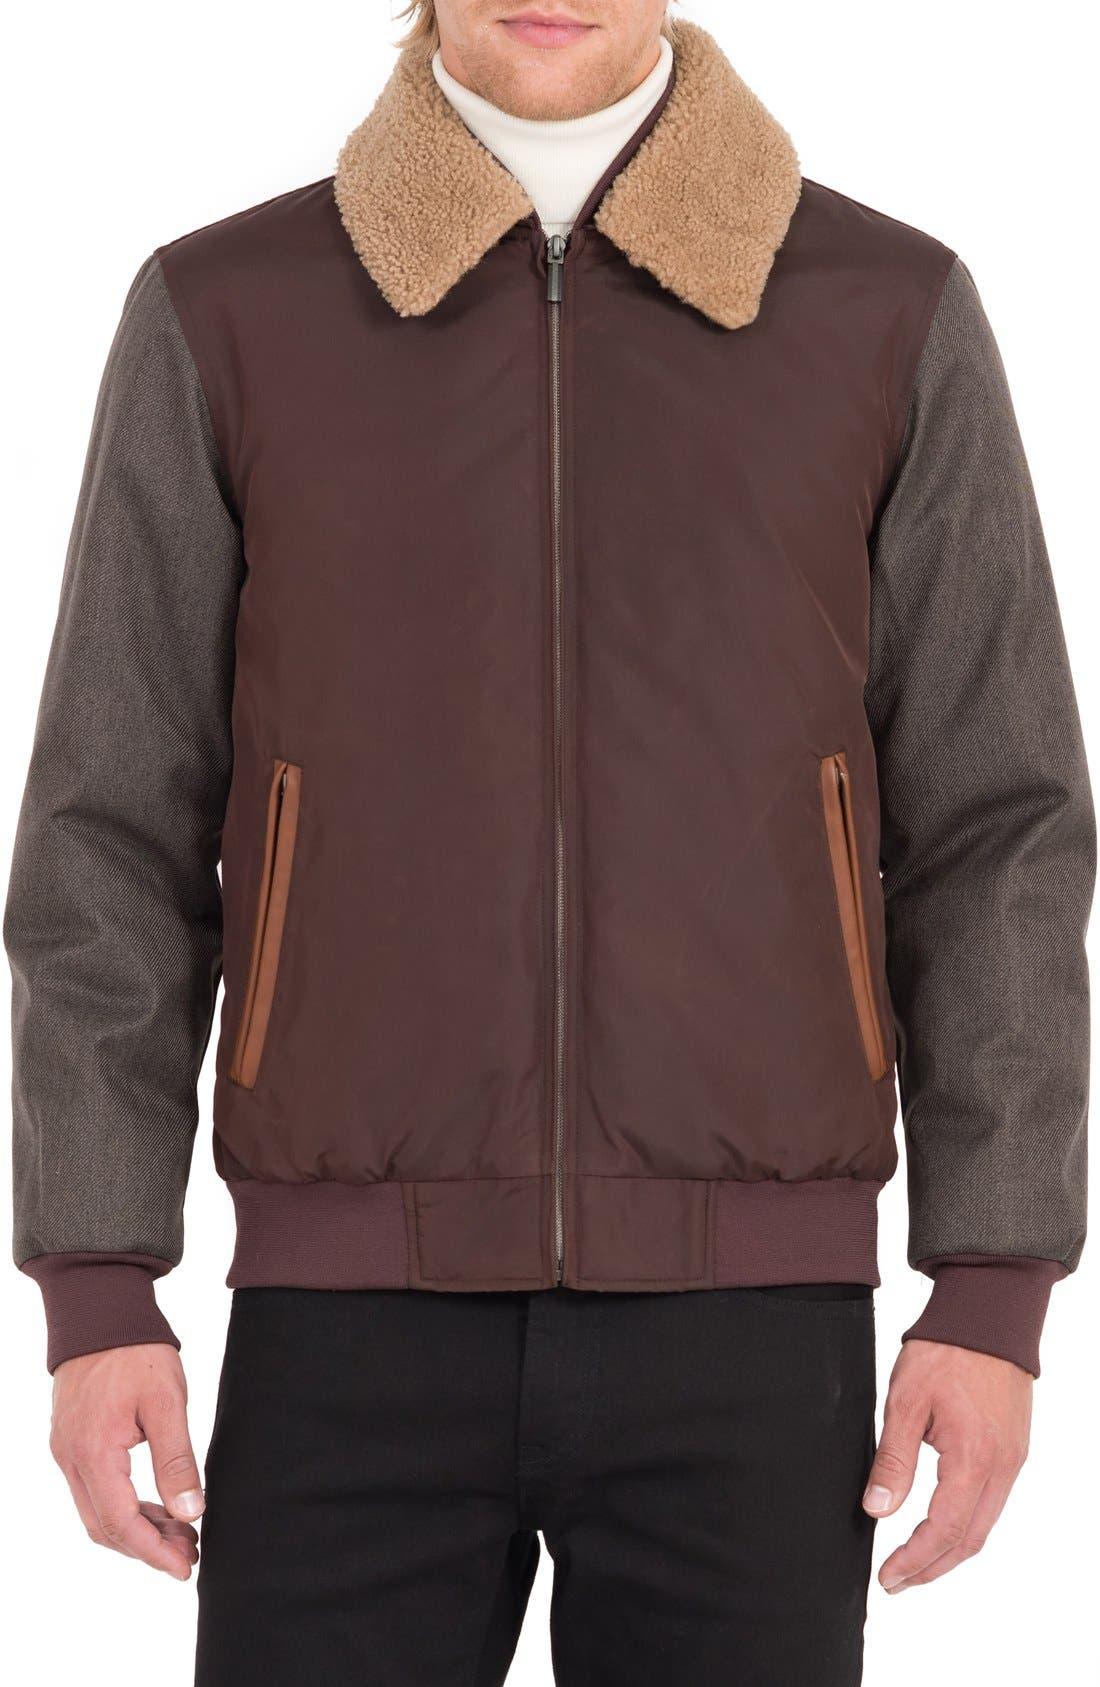 Waxed Nylon Jacket with Faux Shearling Collar,                             Main thumbnail 1, color,                             Burgundy/ Acorn